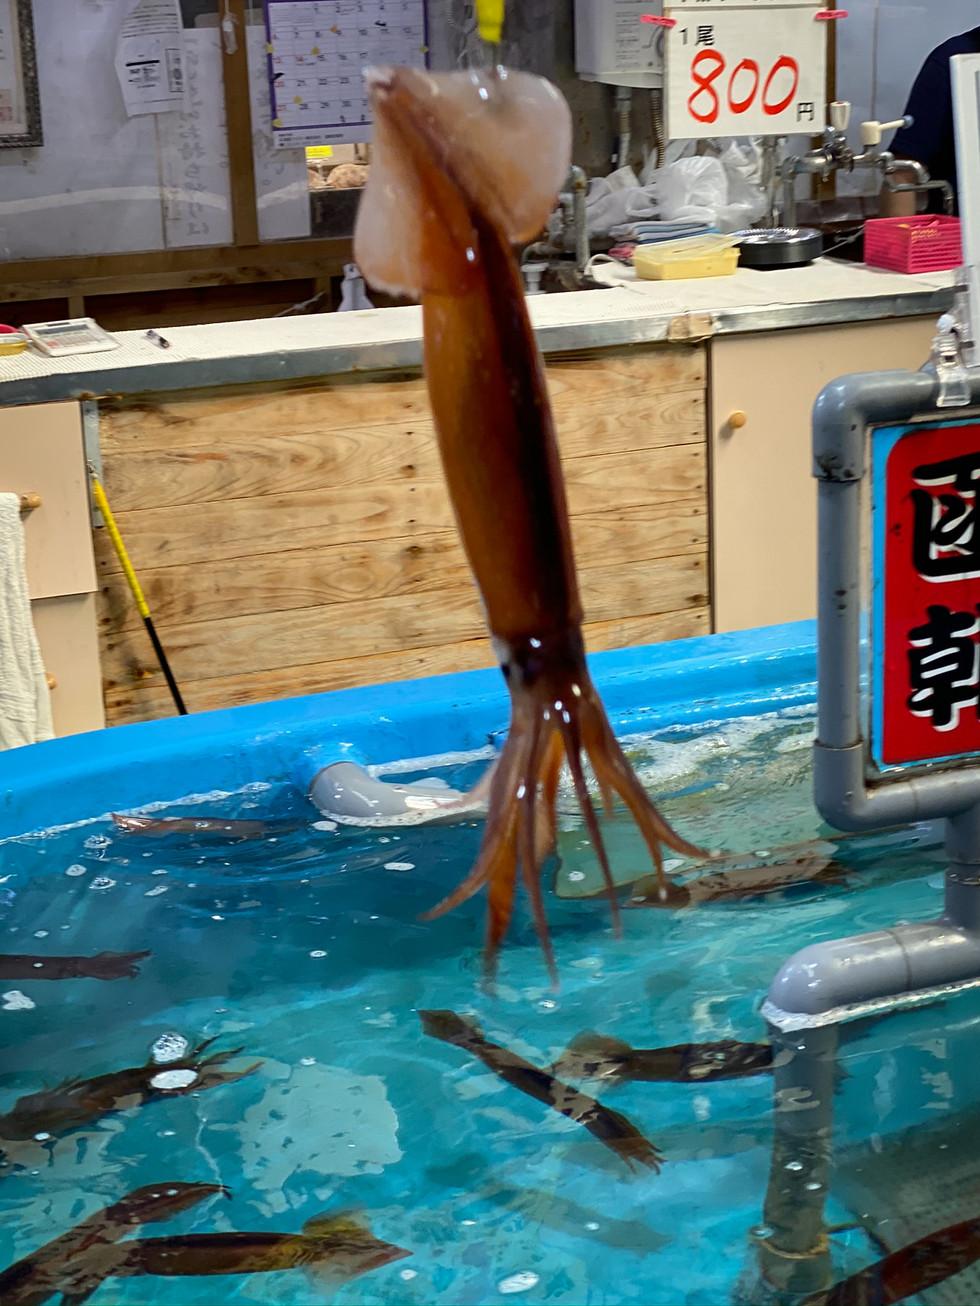 Squid Fishing - Japan Market